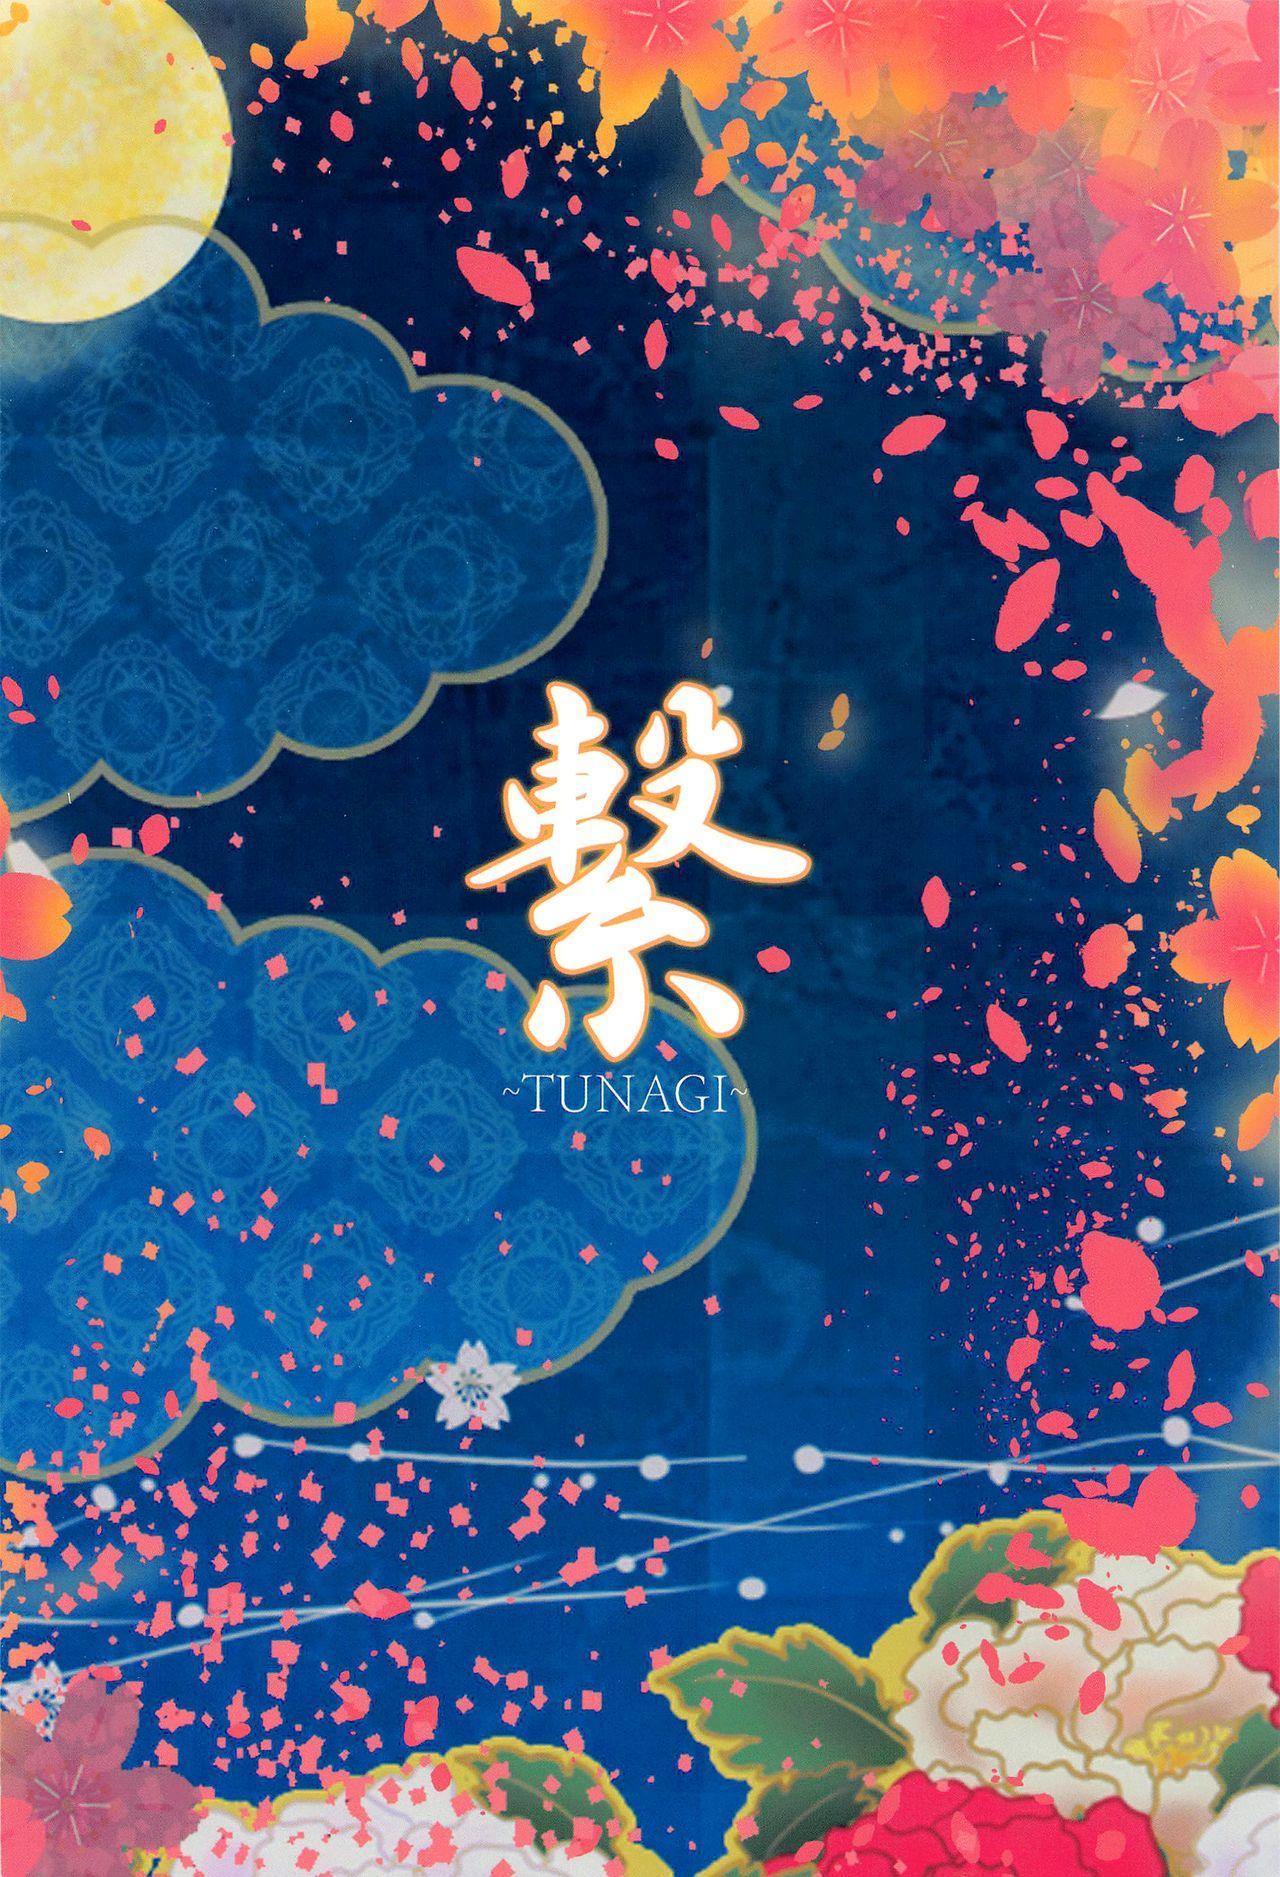 Tsunagi 26